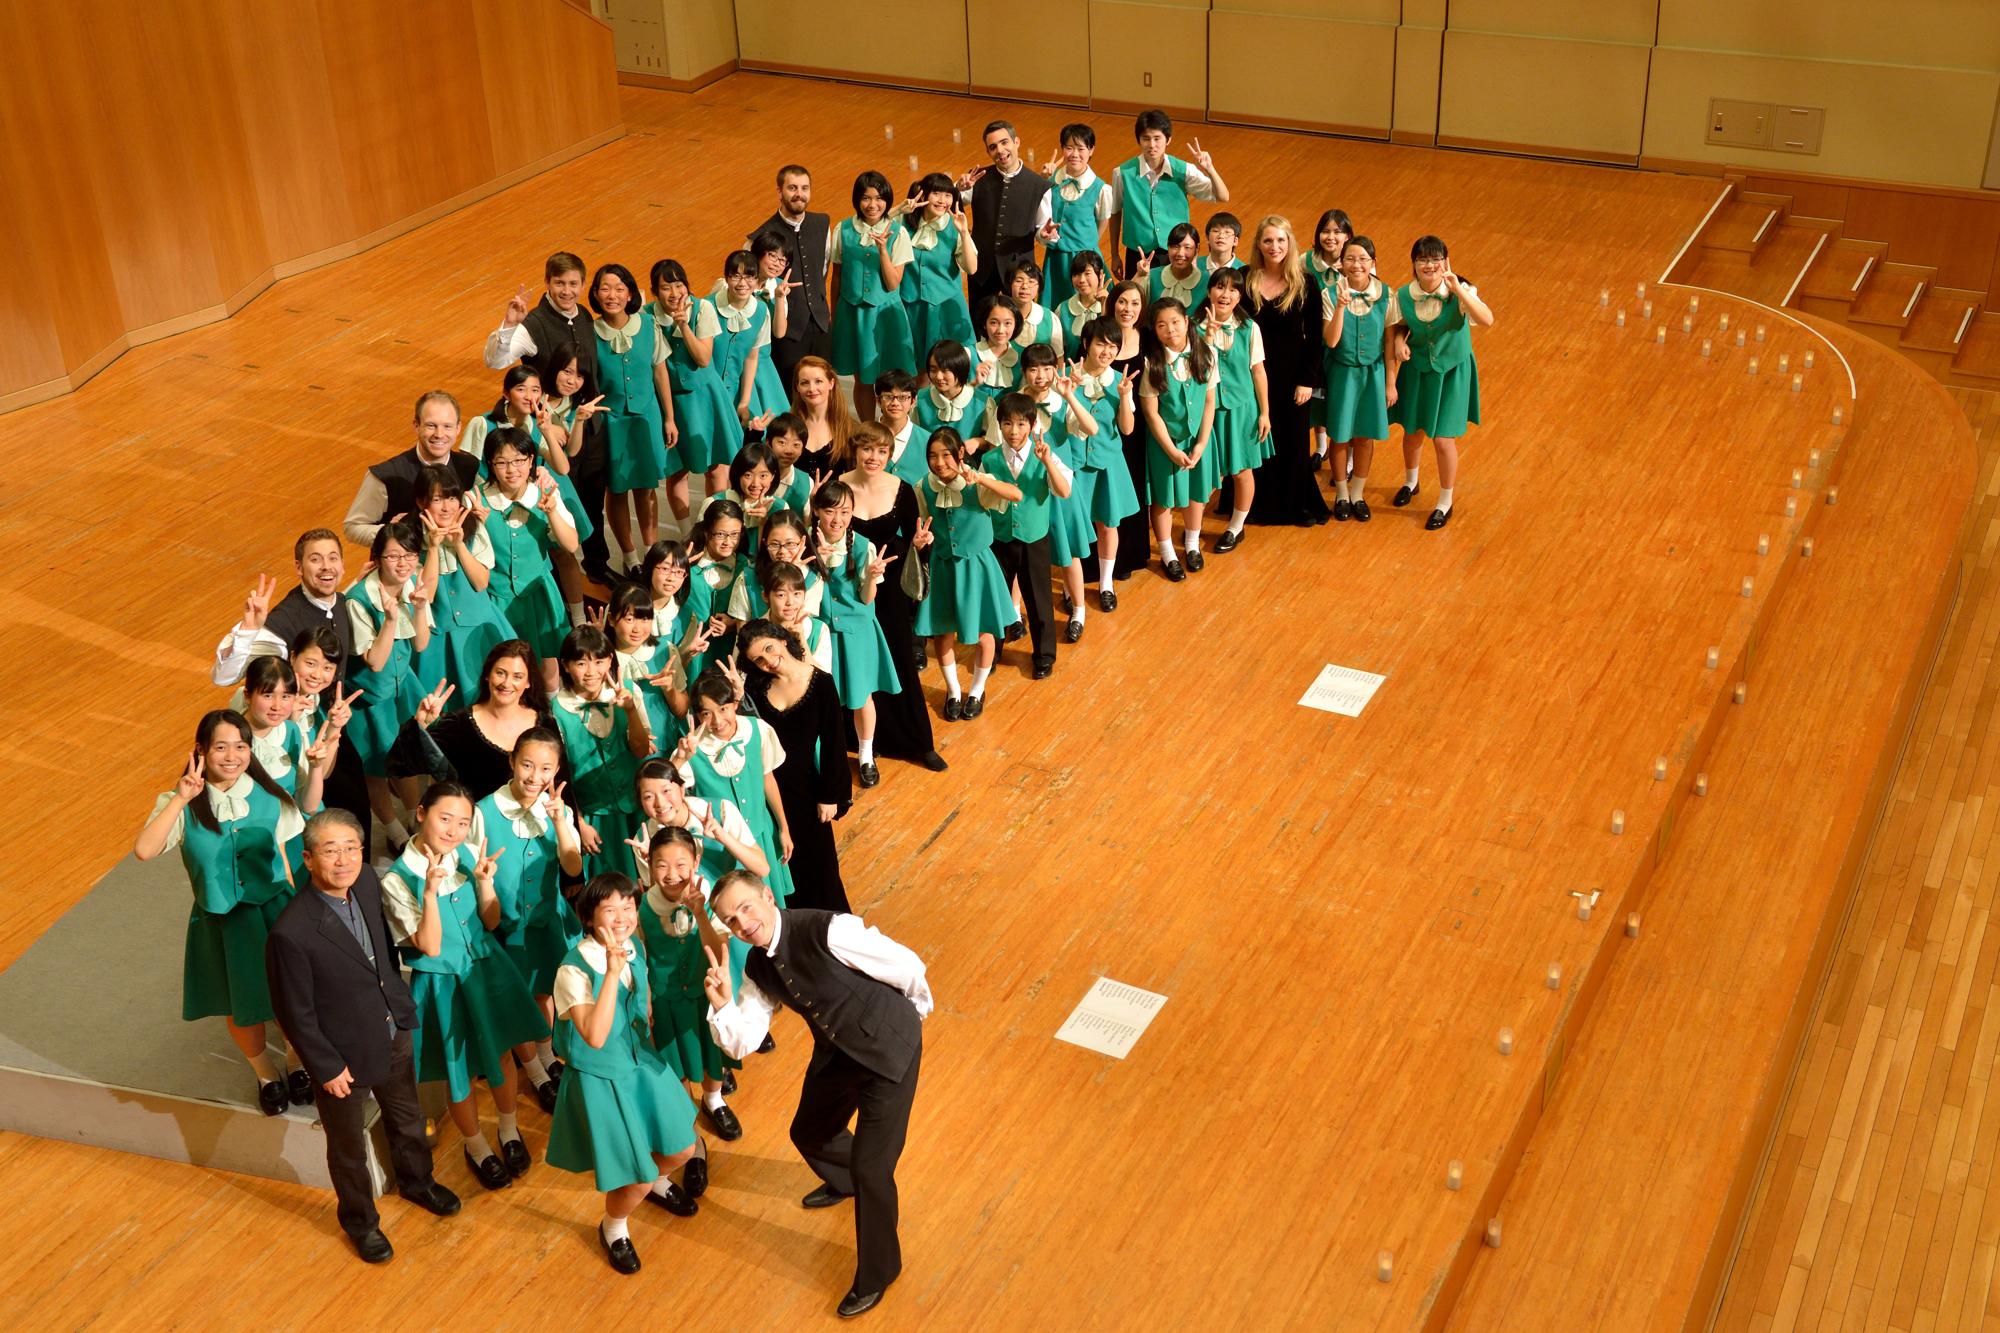 With Hamamatsu Junior Choir, Japan, December 2014